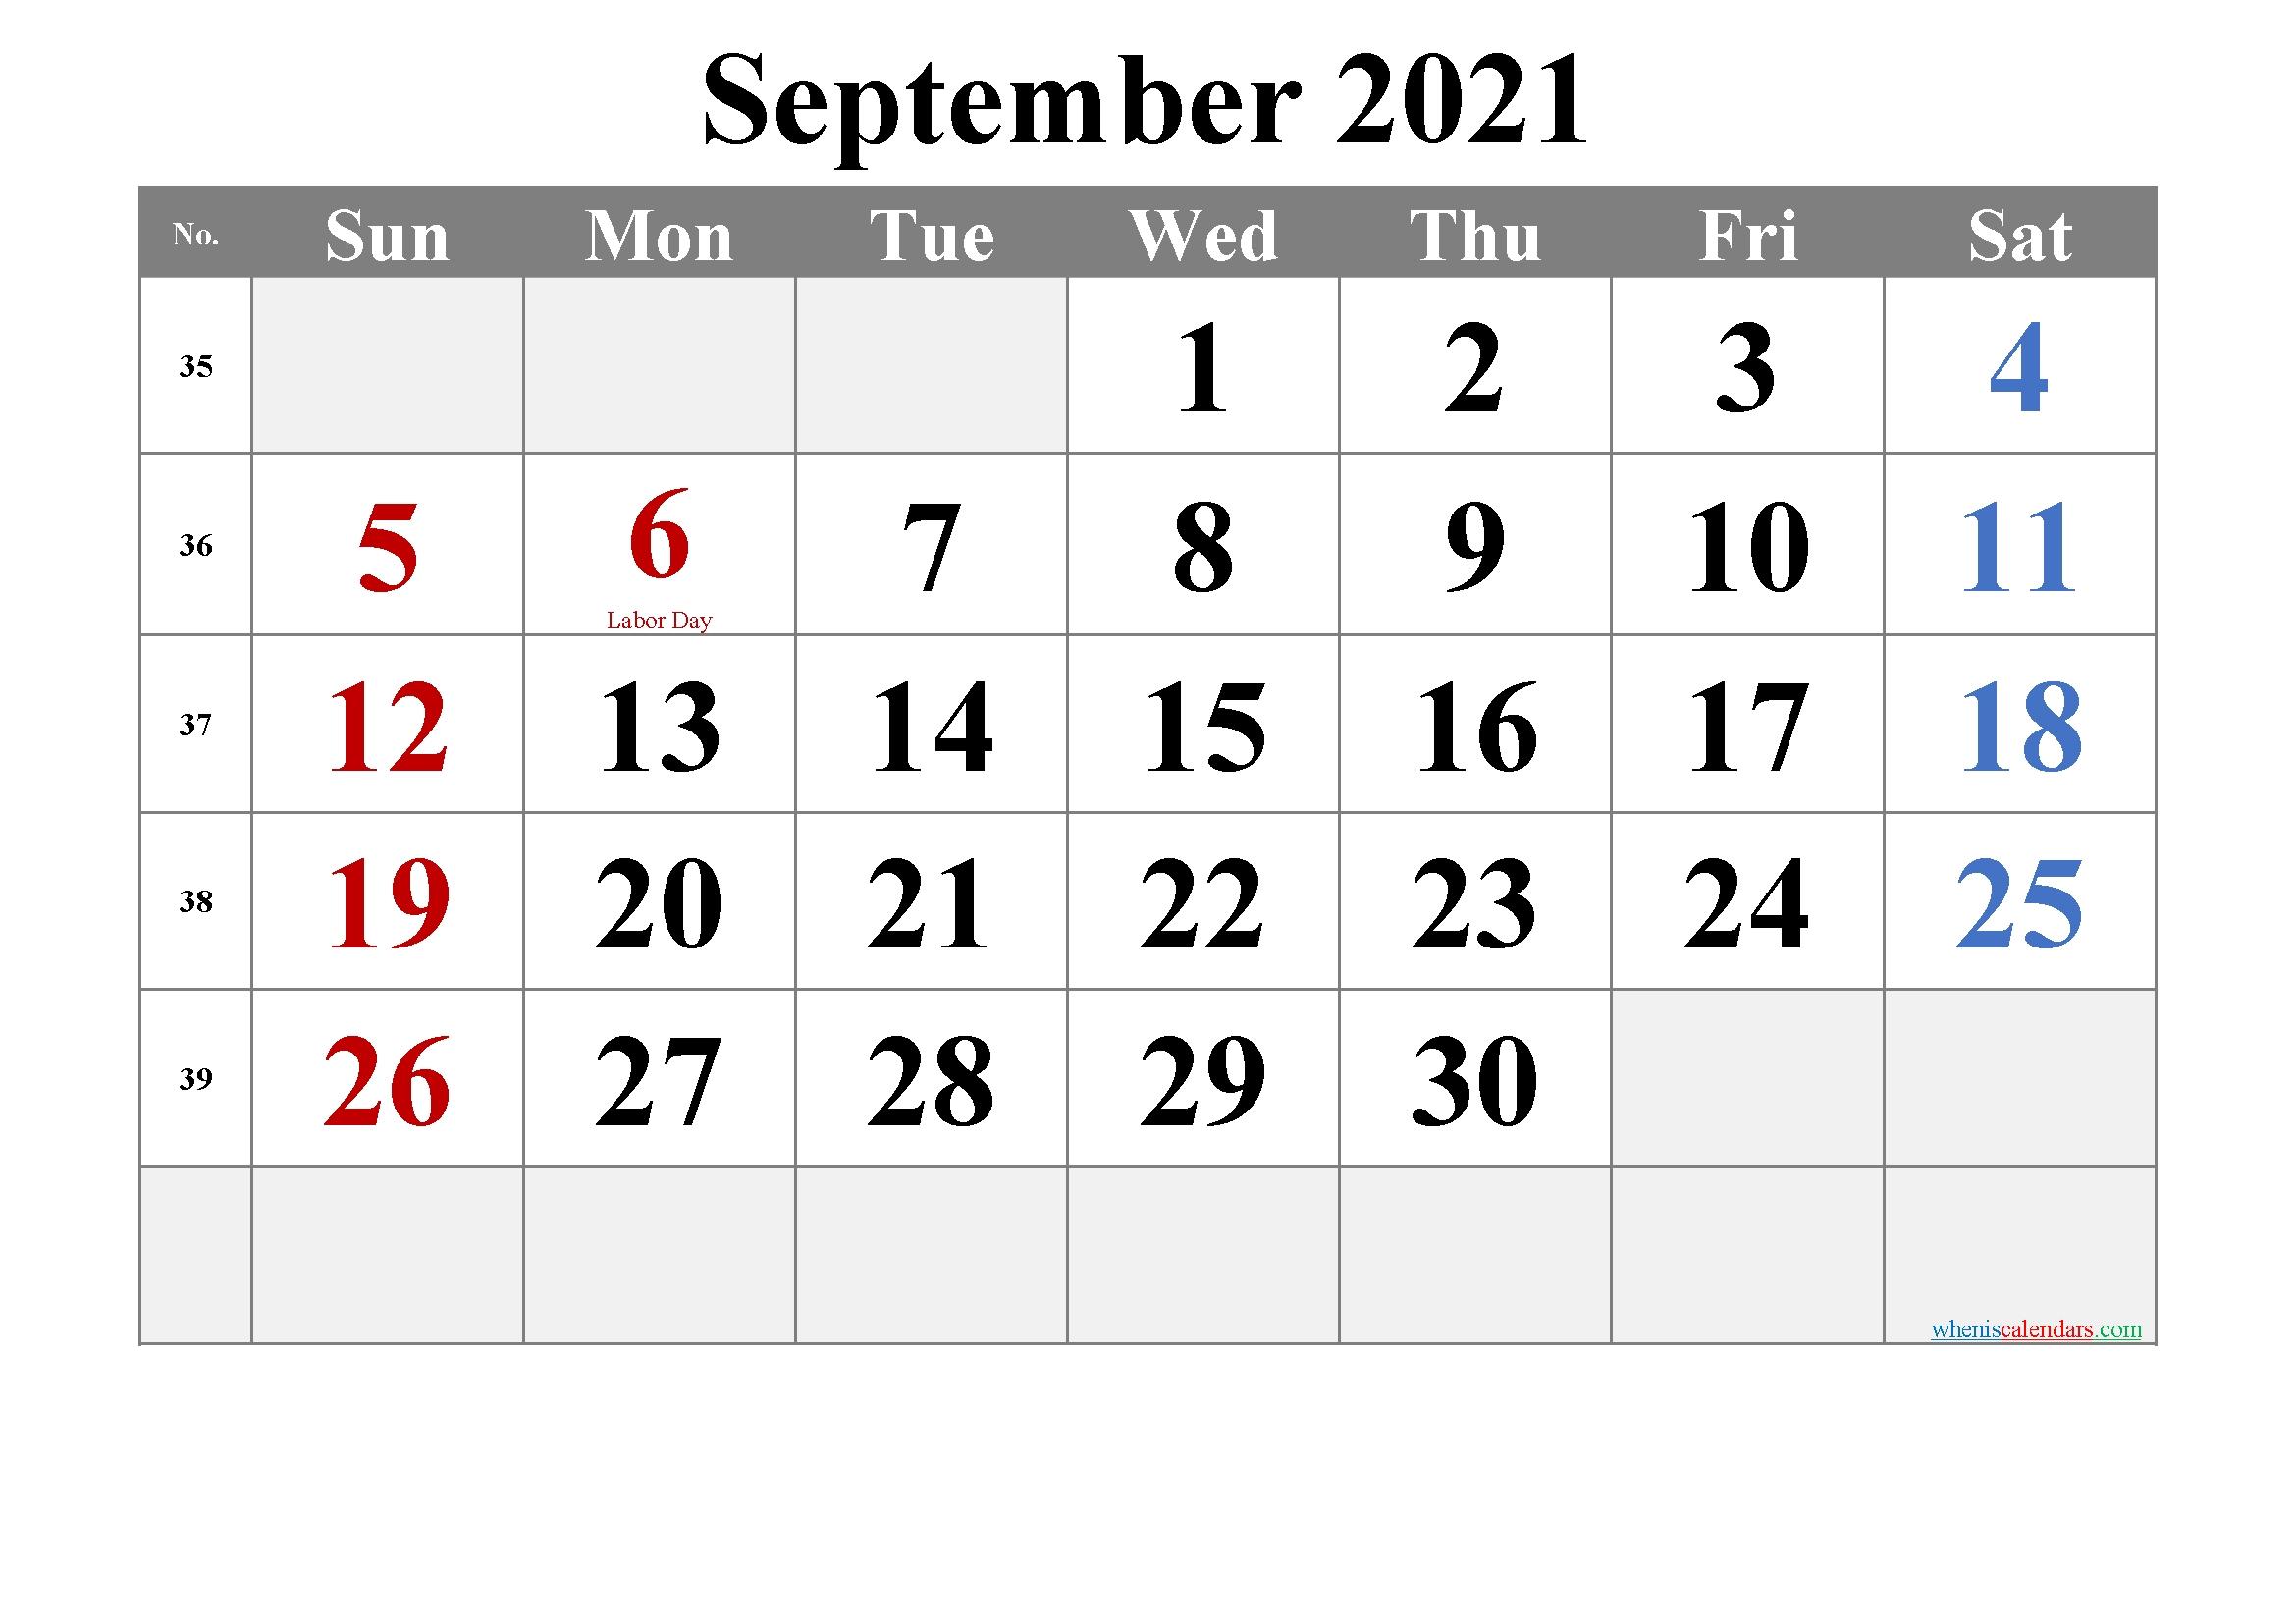 Free Printable September 2021 Calendar In 2020 | Calendar